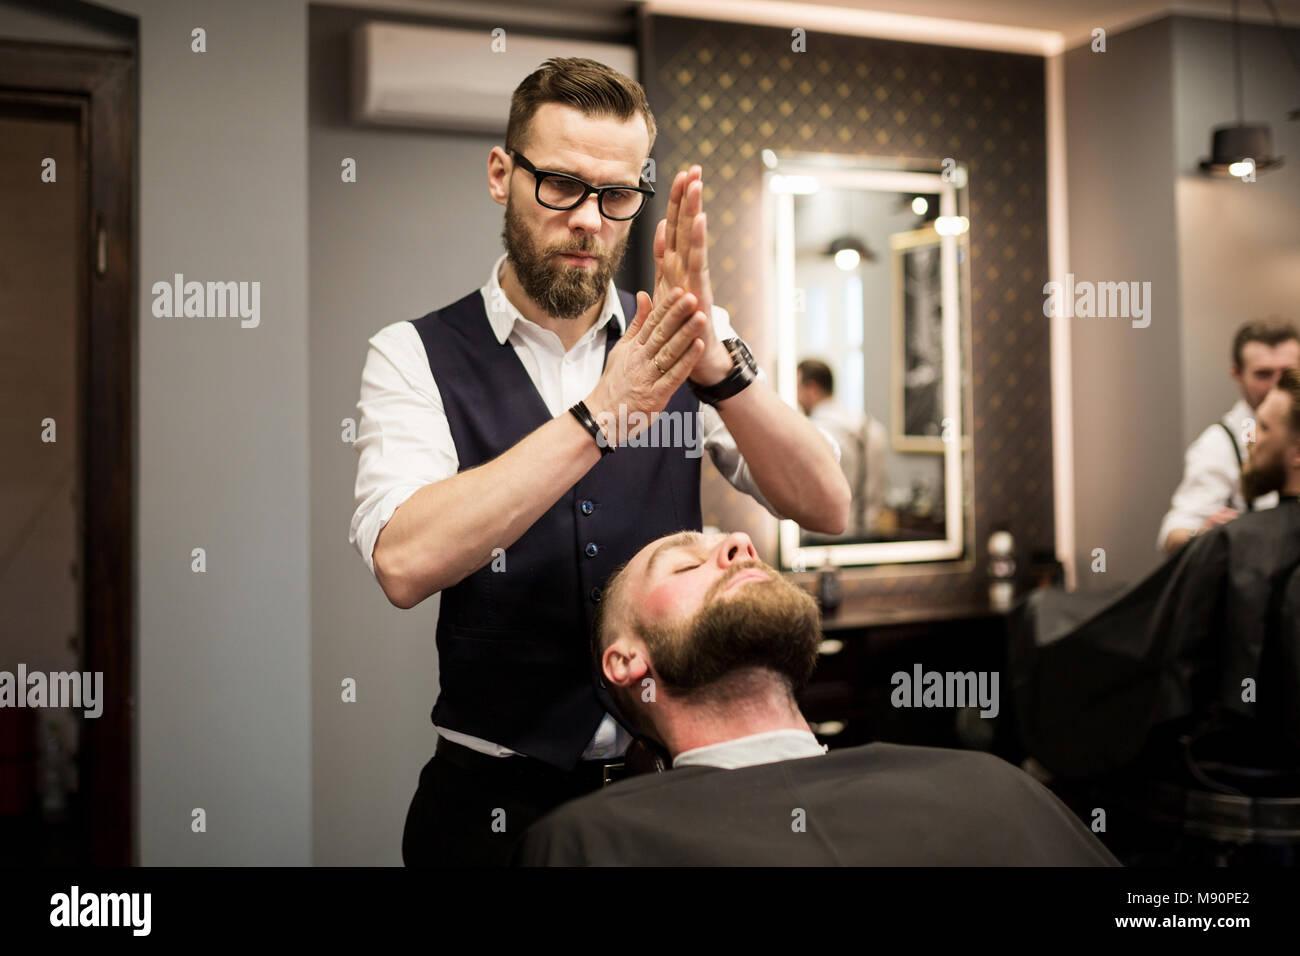 Portrait of barber rubbing foam in hands before shaving - Stock Image